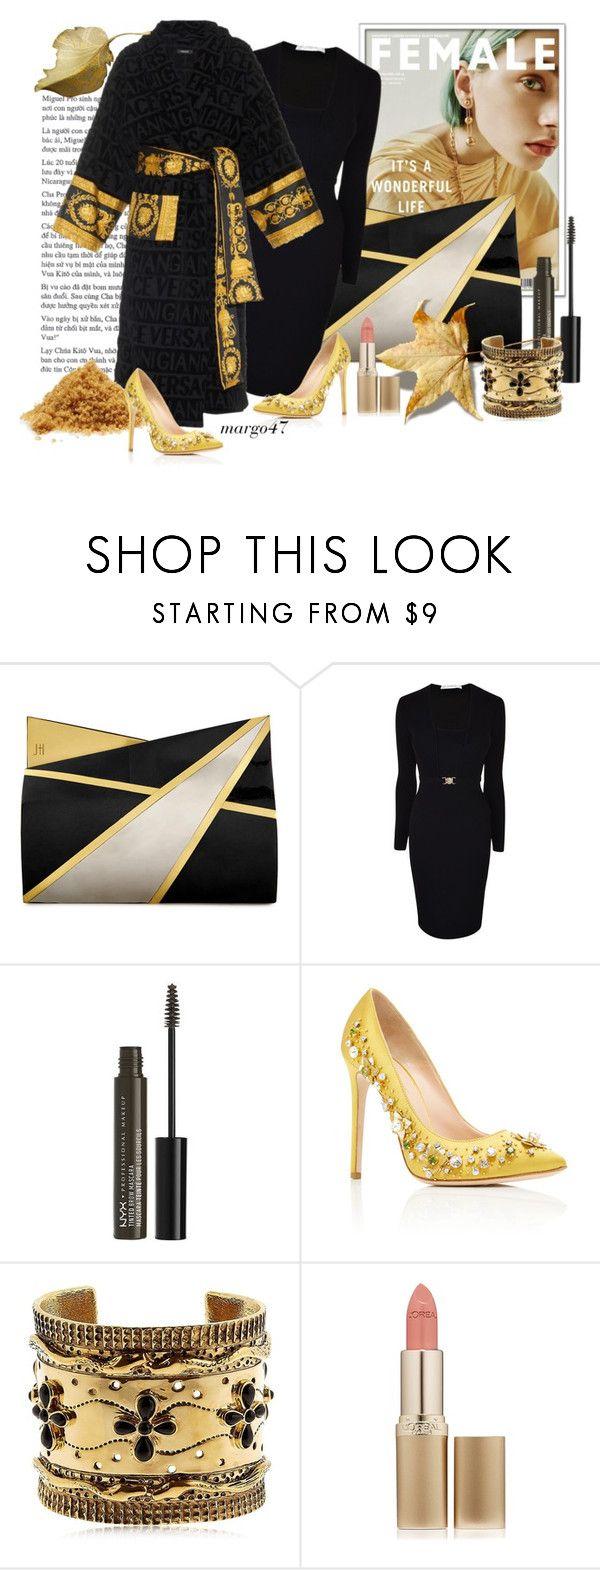 """elegancja"" by margo47 ❤ liked on Polyvore featuring Jill Haber, Versace, NYX, GEDEBE, Aurélie Bidermann and L'Oréal Paris"